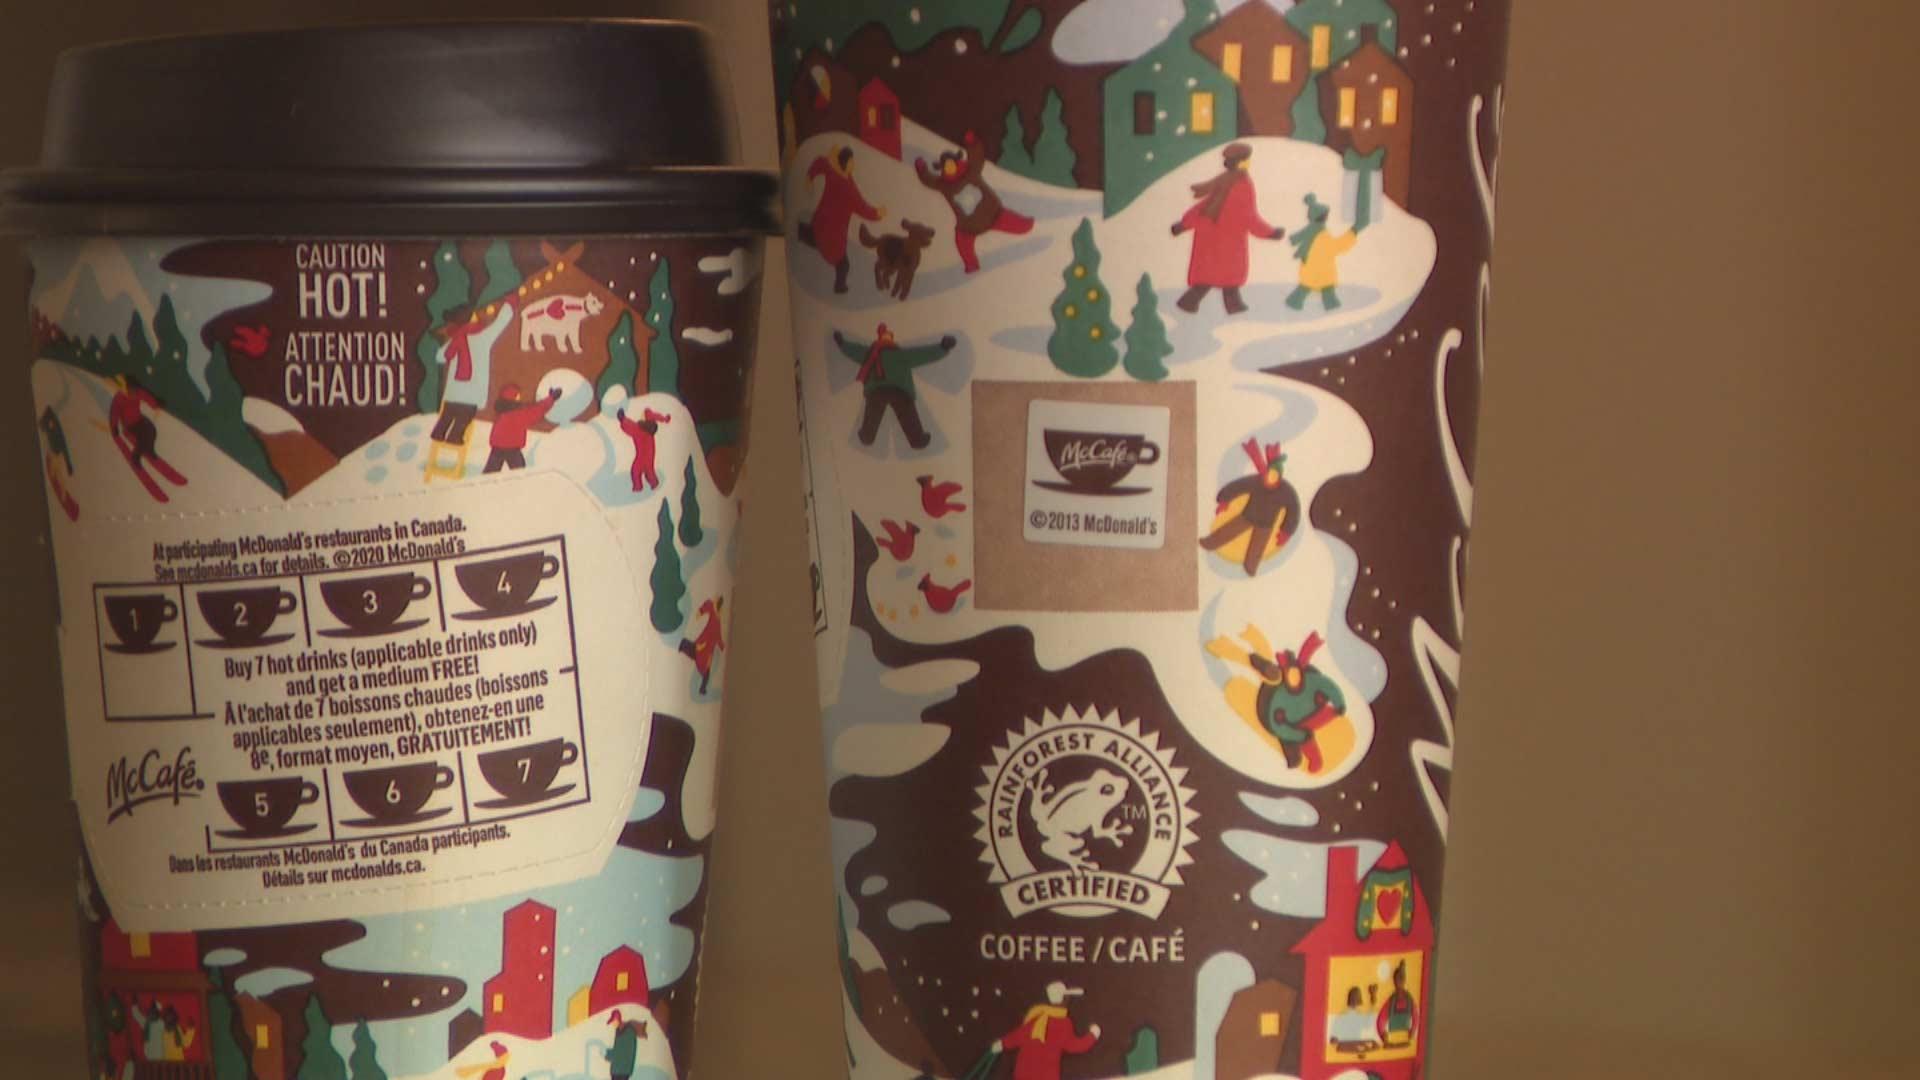 McDonald's festive cups